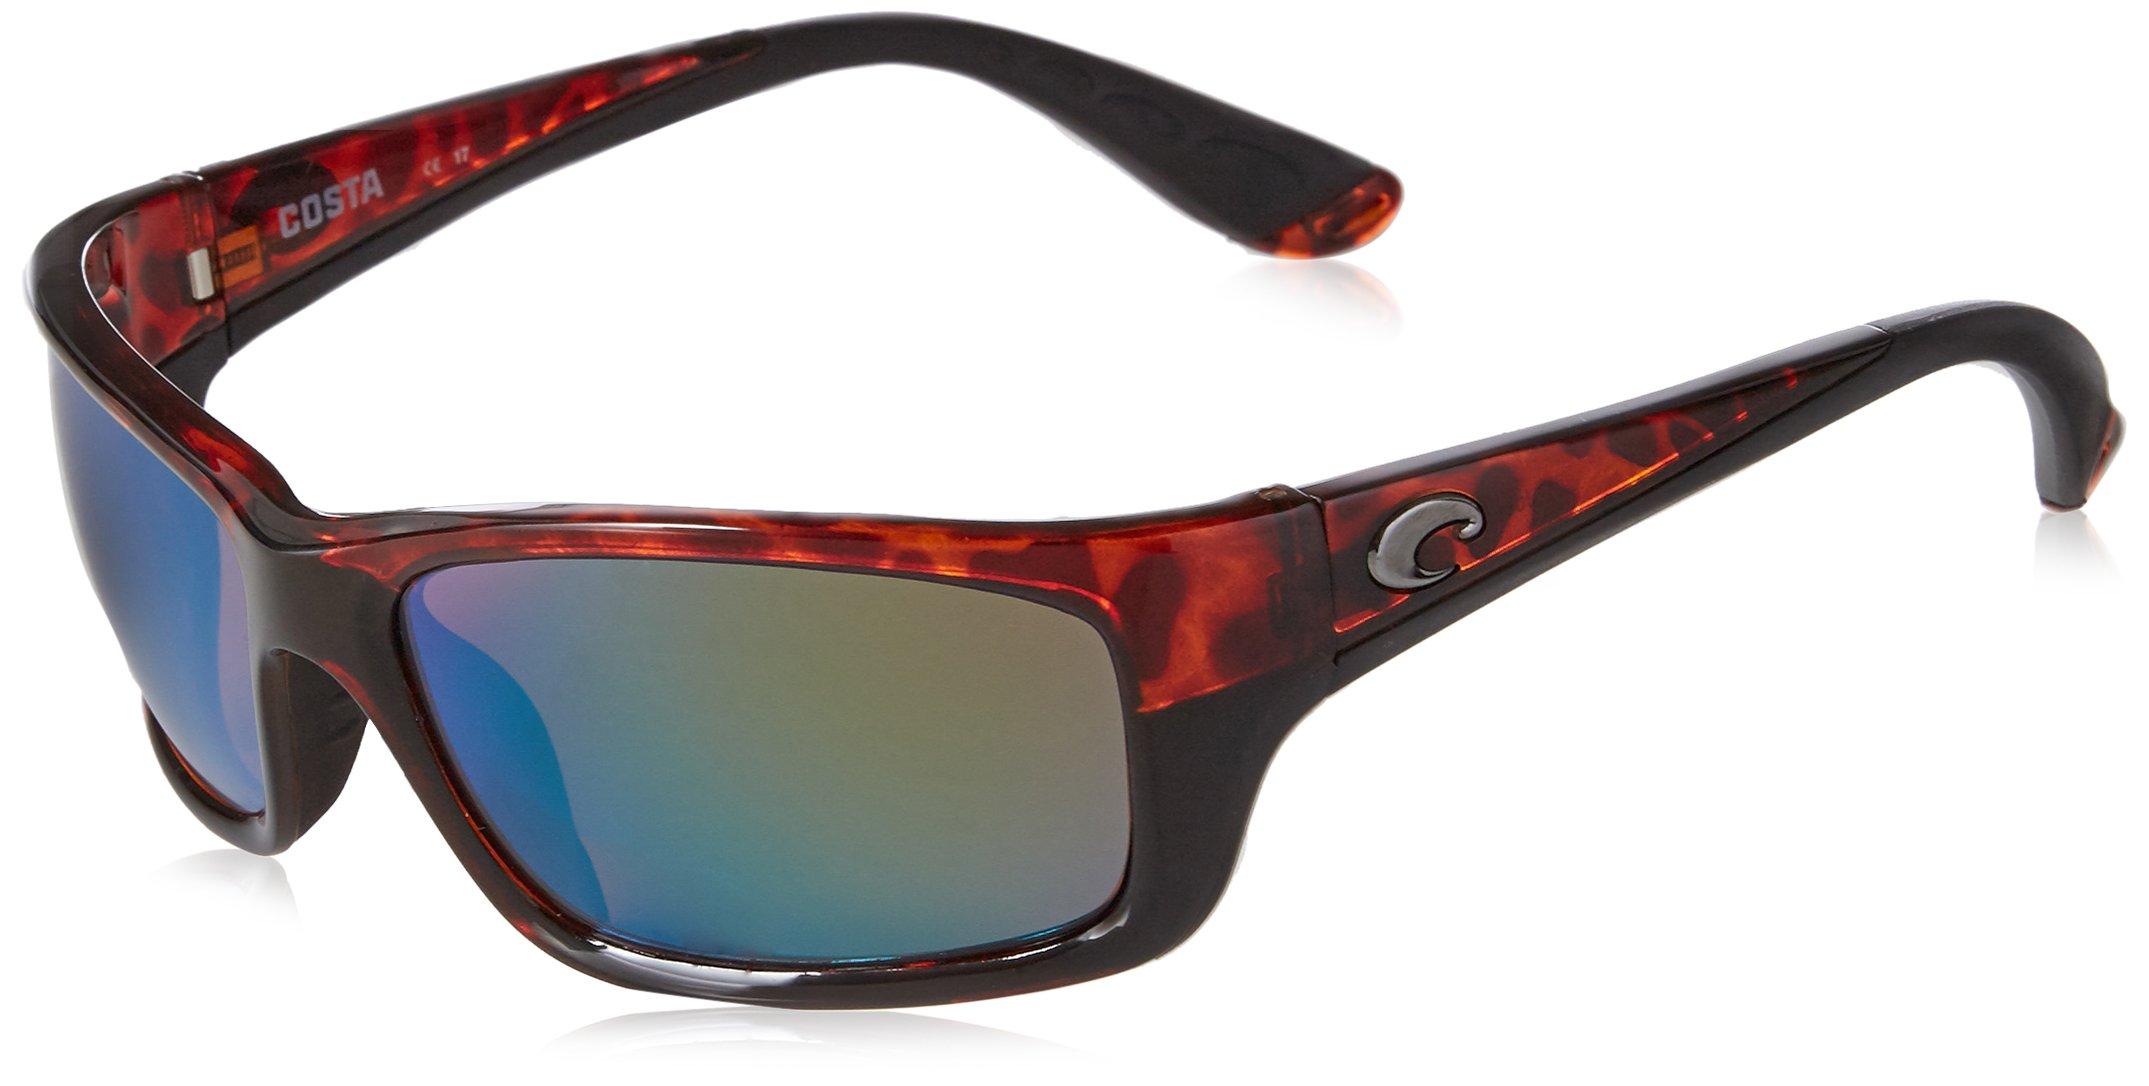 Costa del Mar Unisex-Adult Jose JO 10 OGMGLP Polarized Iridium Wrap Sunglasses